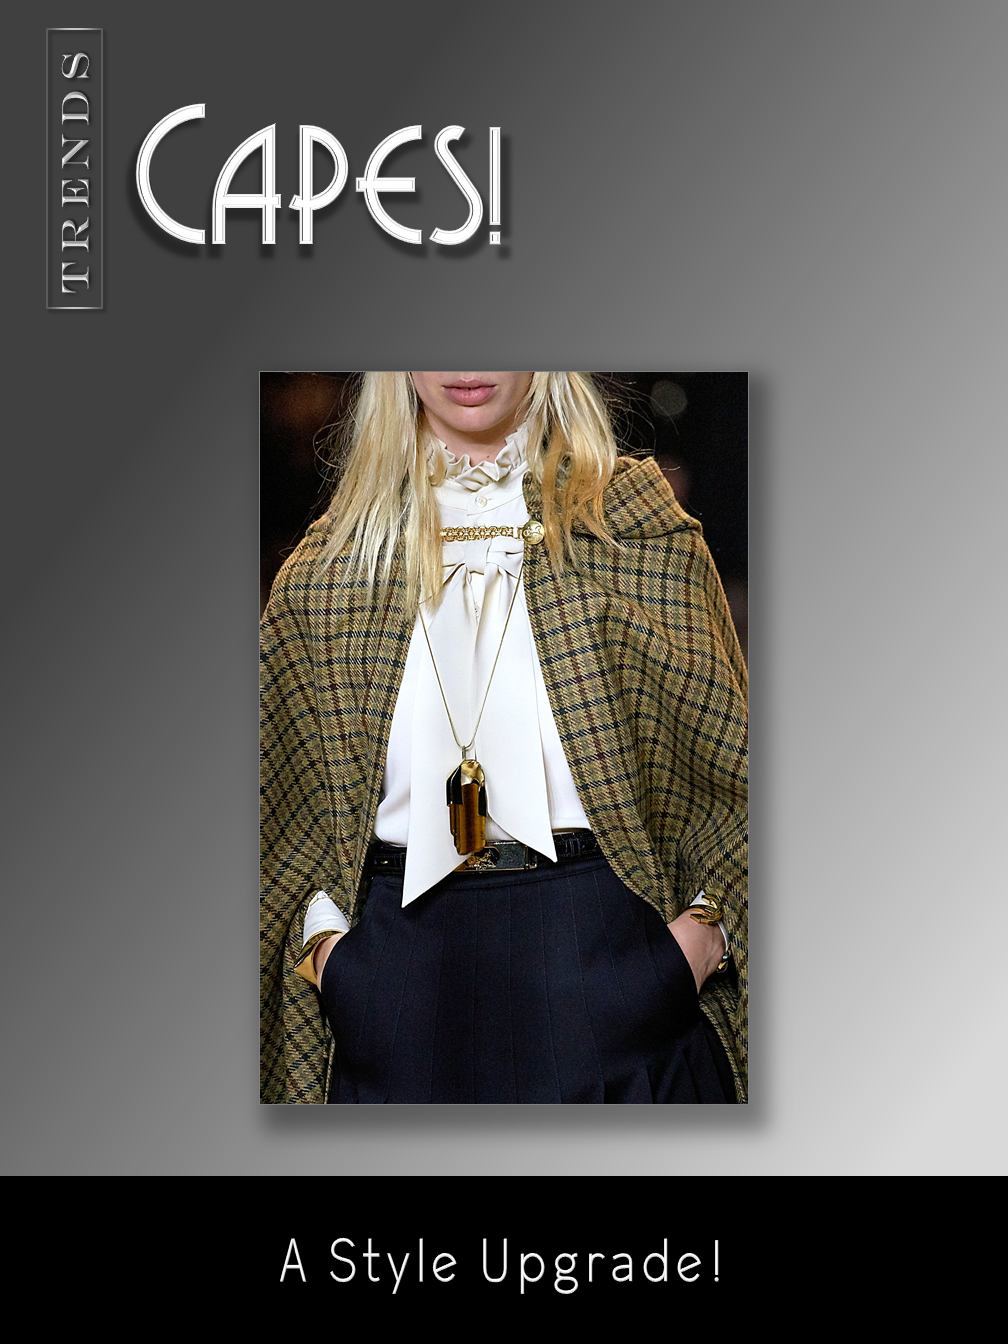 Lets Talk about Capes